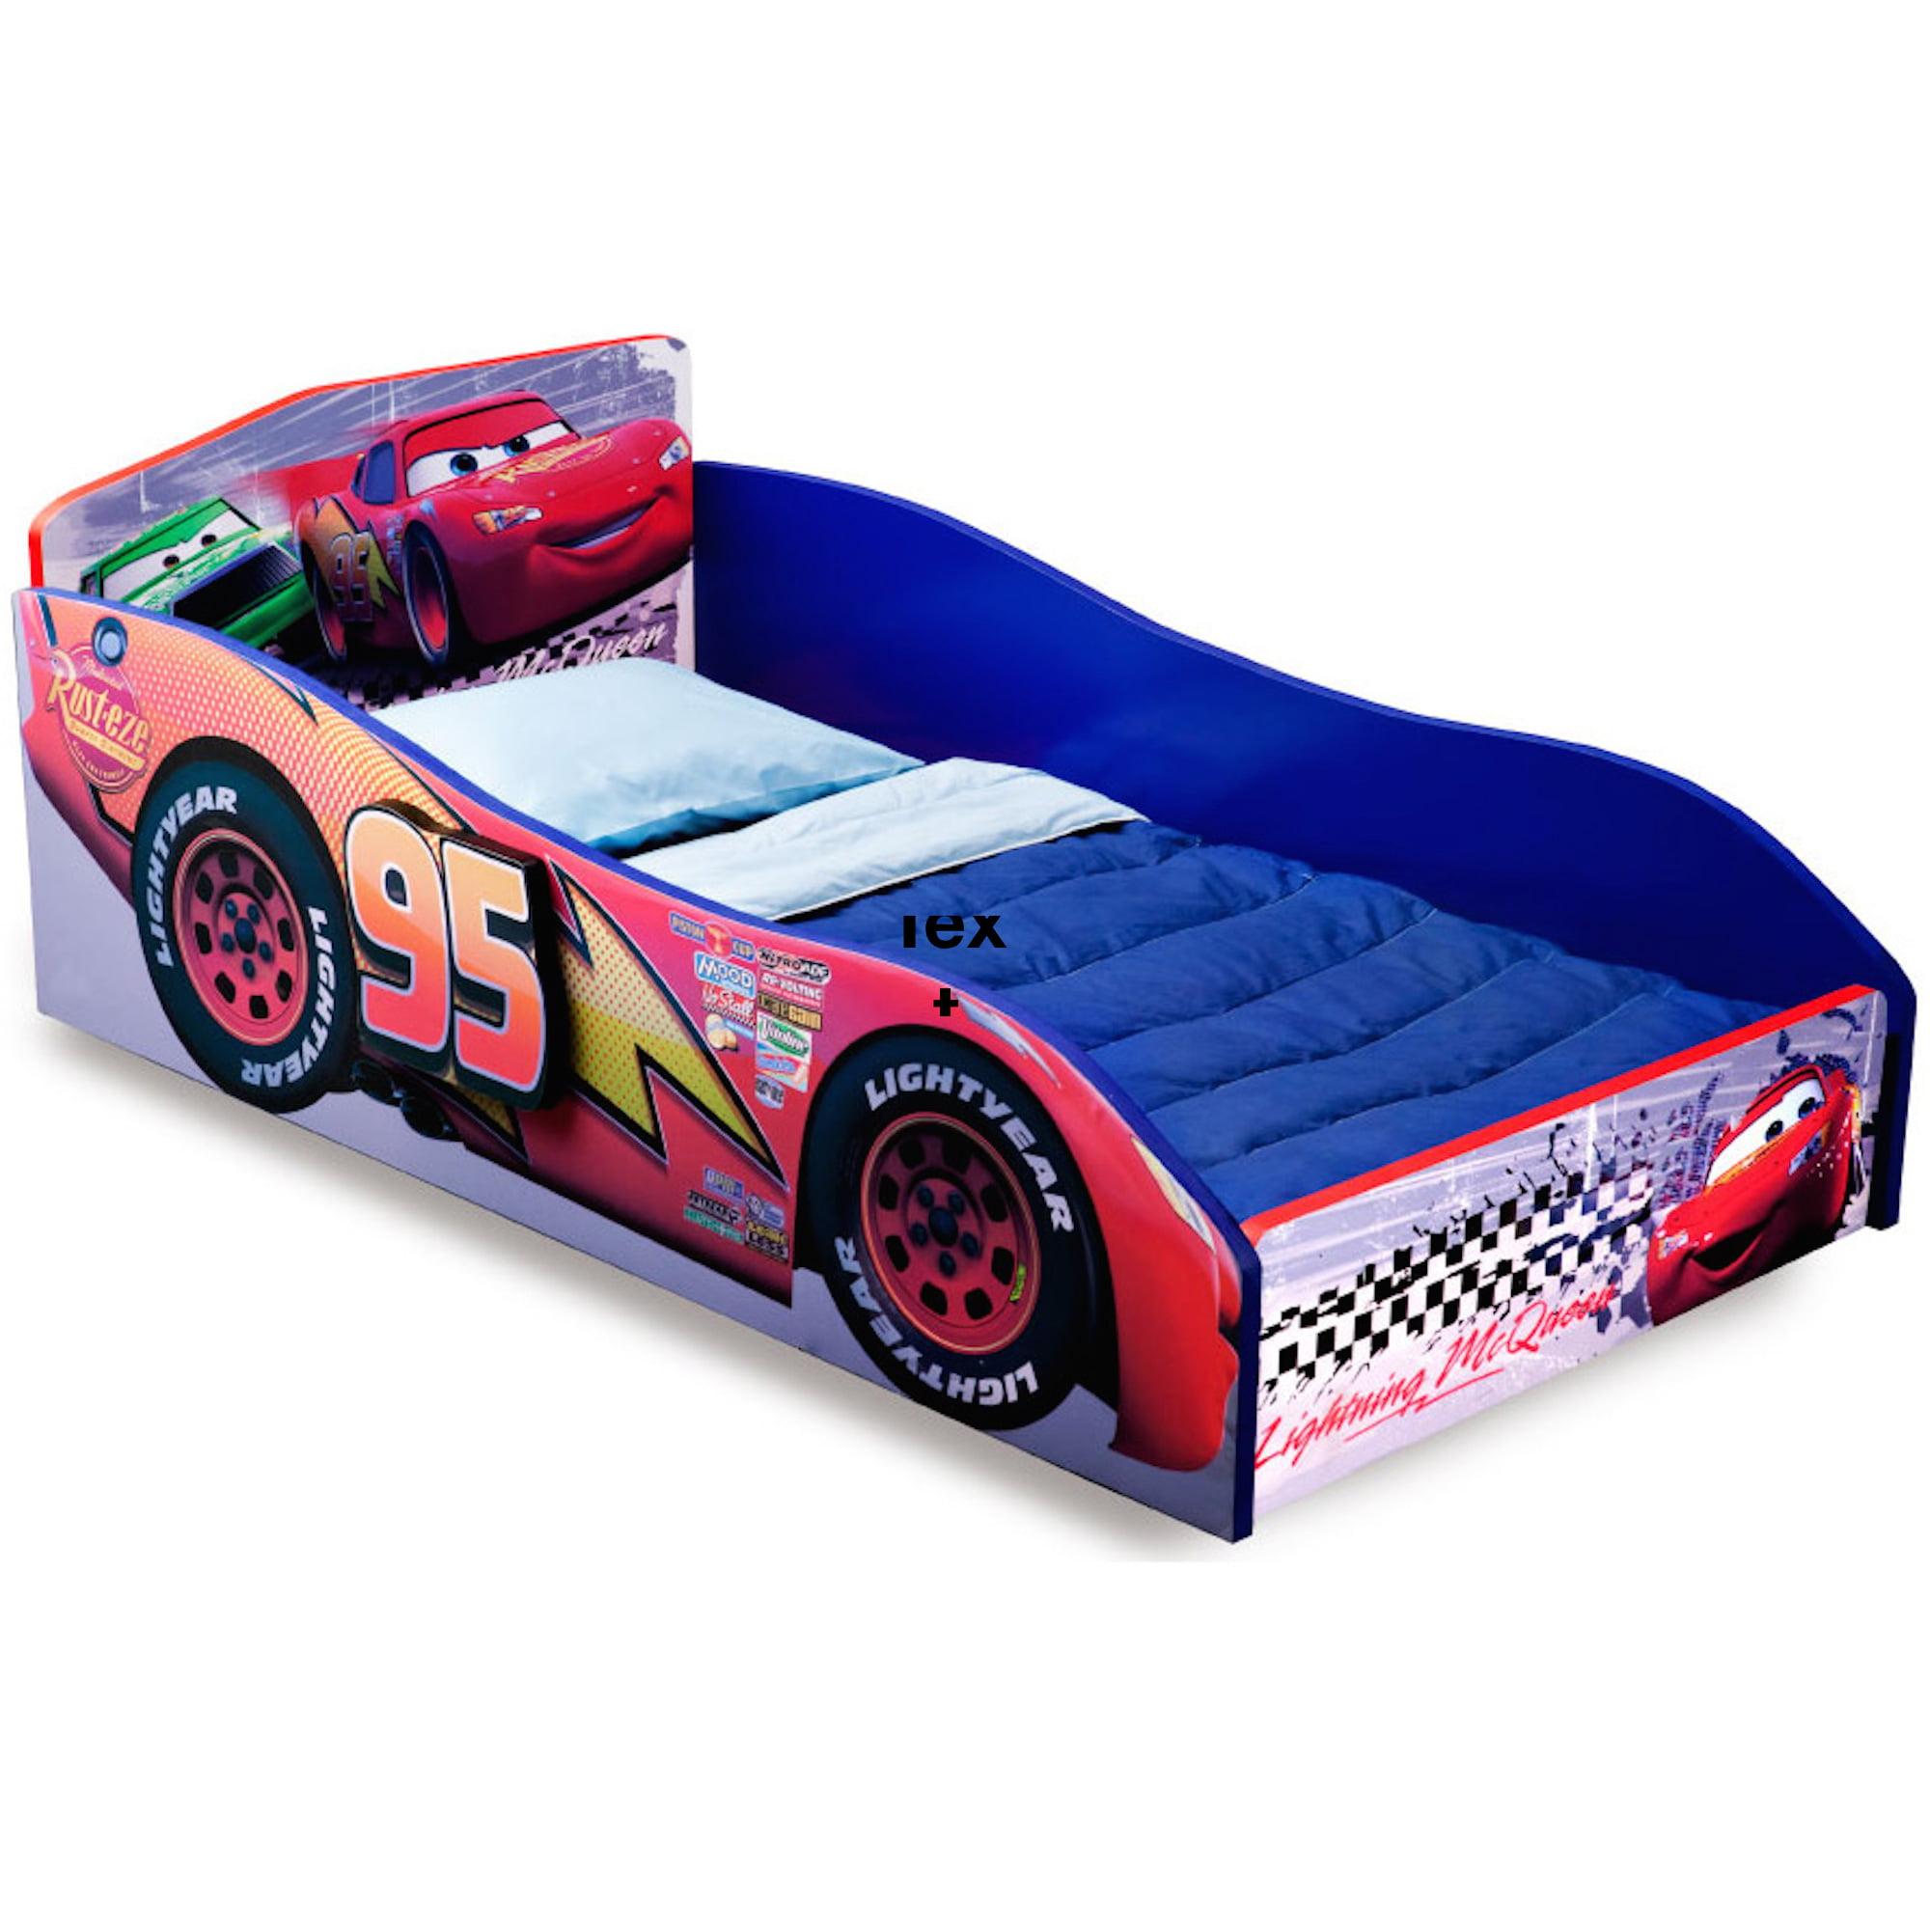 Disney Pixar Cars Wooden Toddler Bed by Delta Children